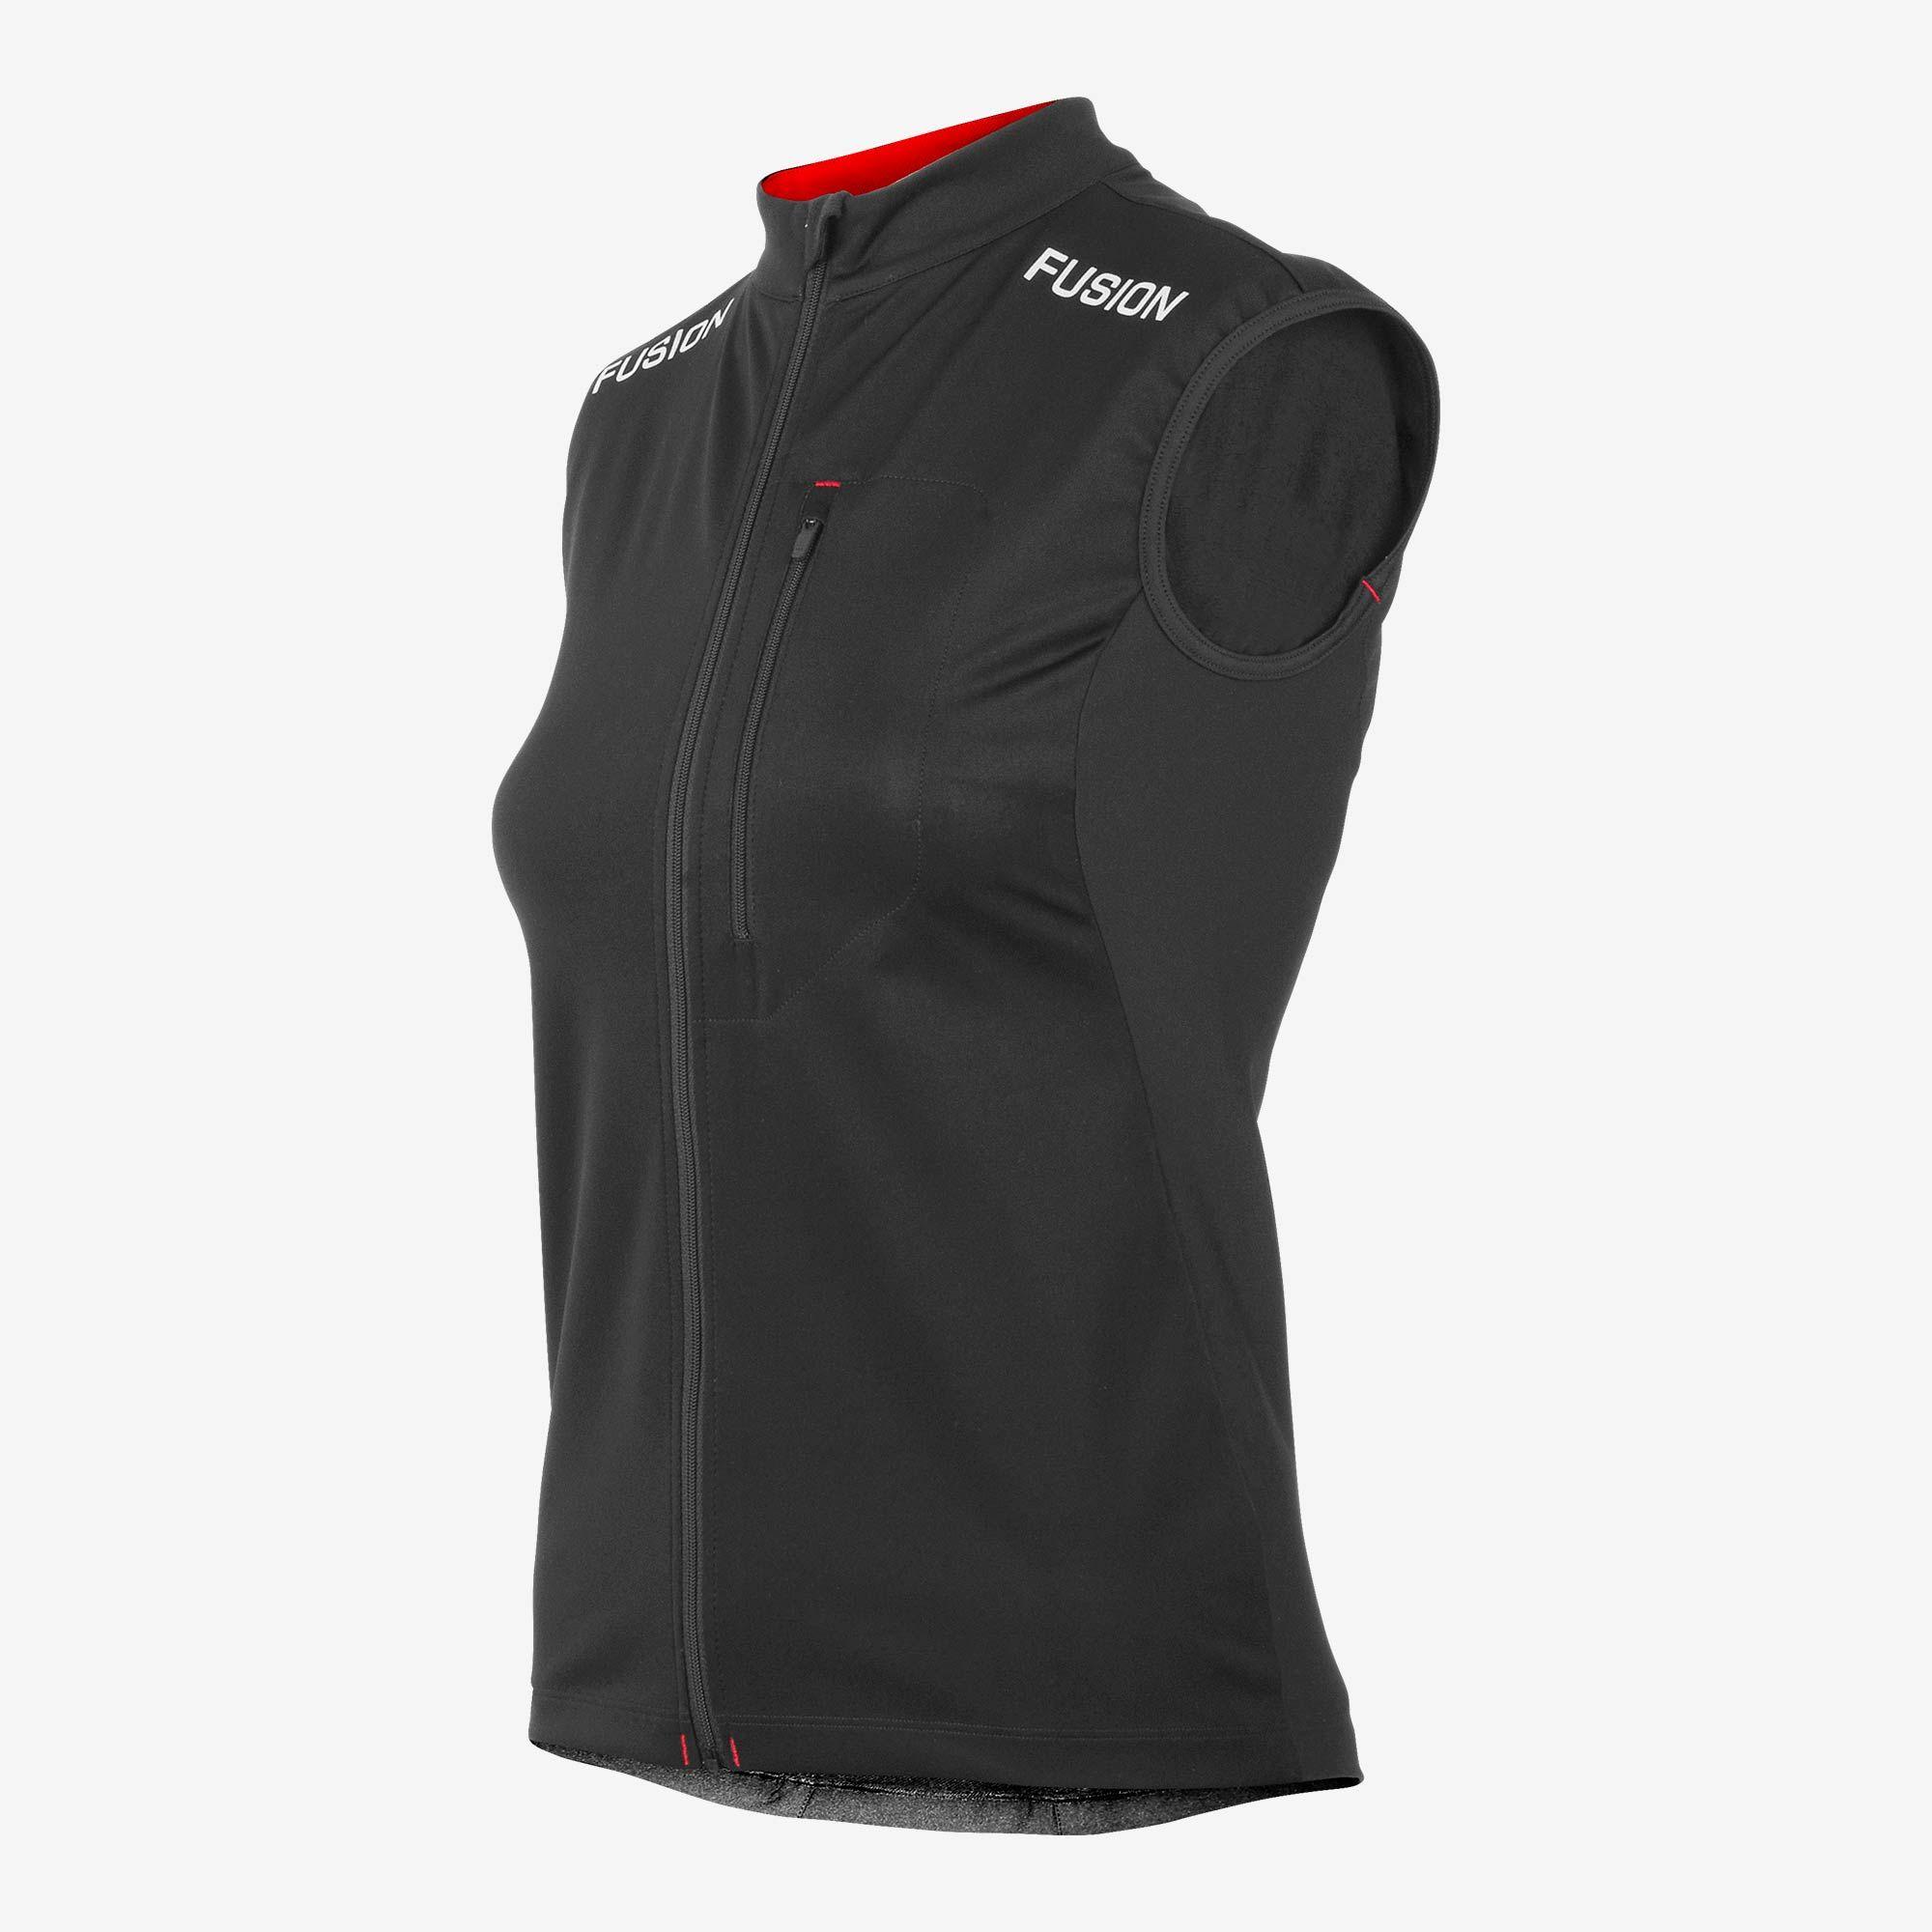 Fusion Women S2 Run Vest (Schwarz)